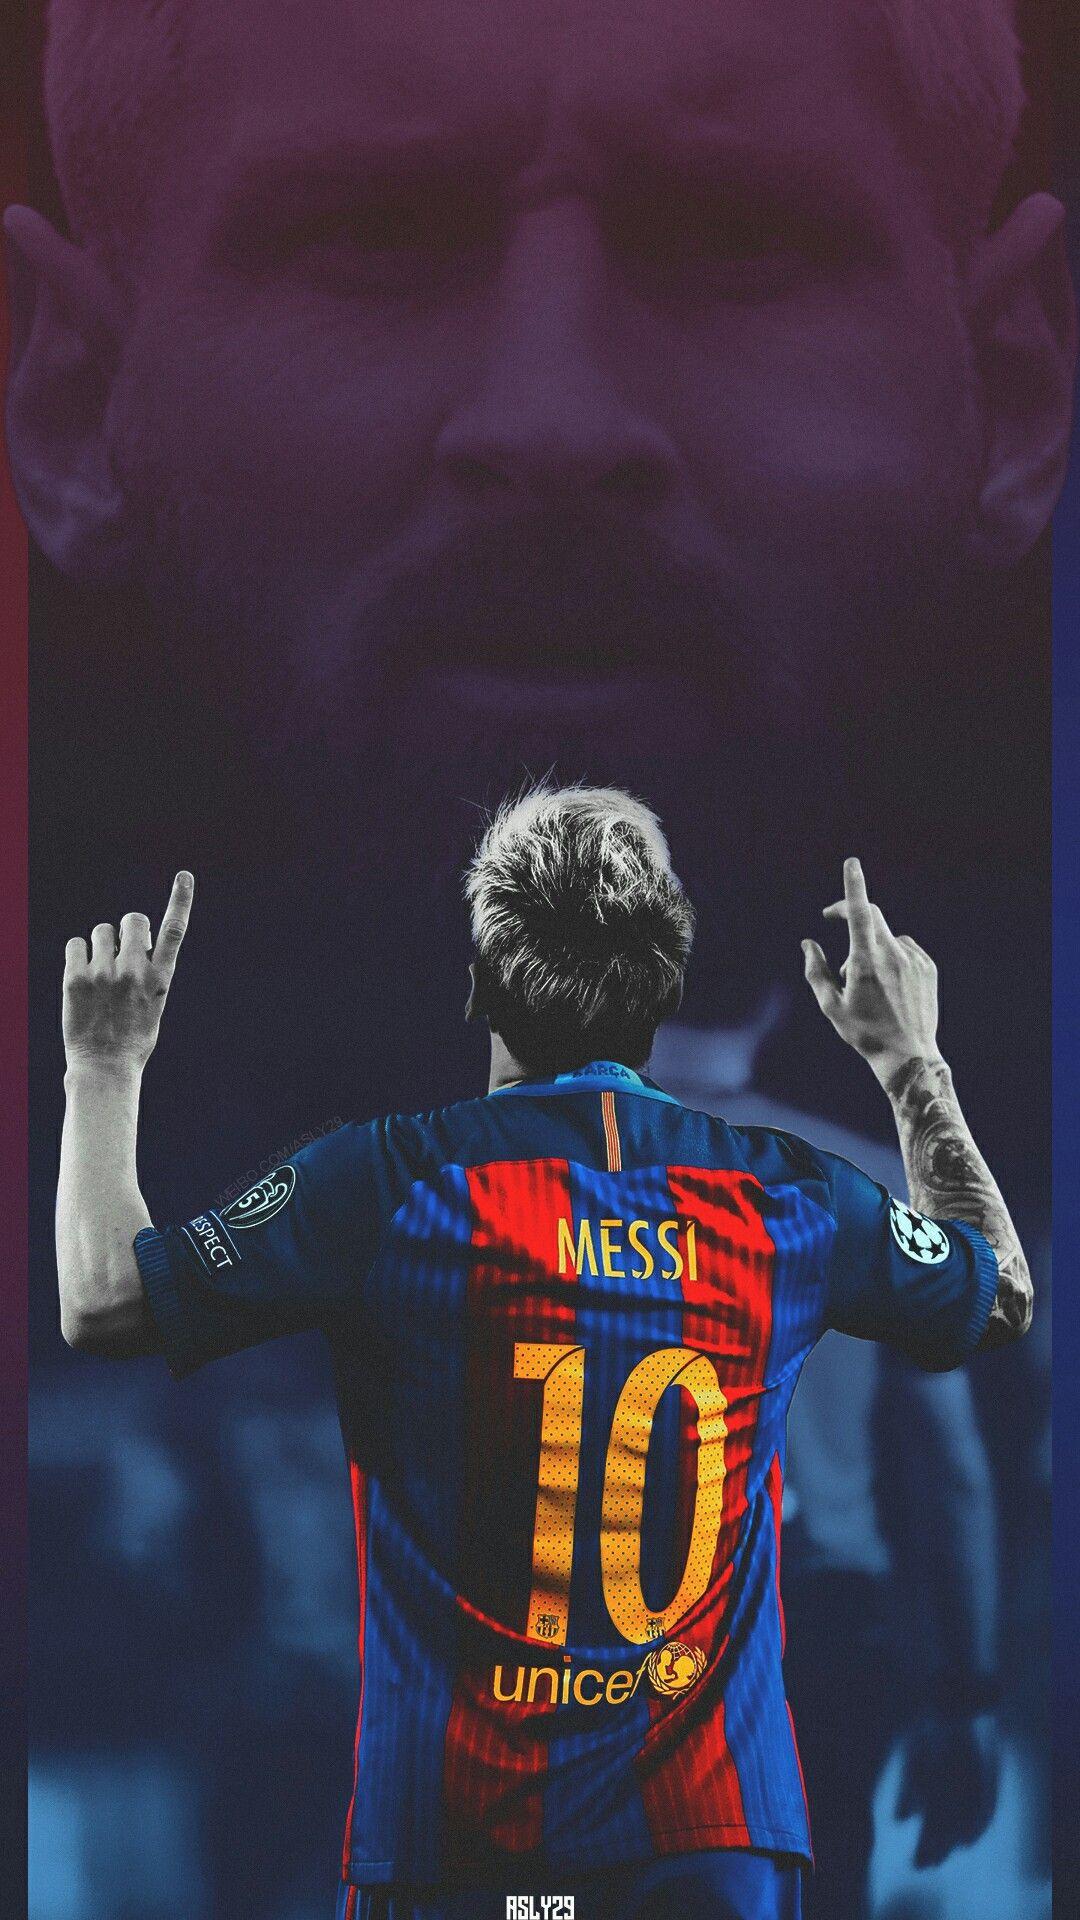 the king Barcelona wallpaper Pinterest Messi, Lionel